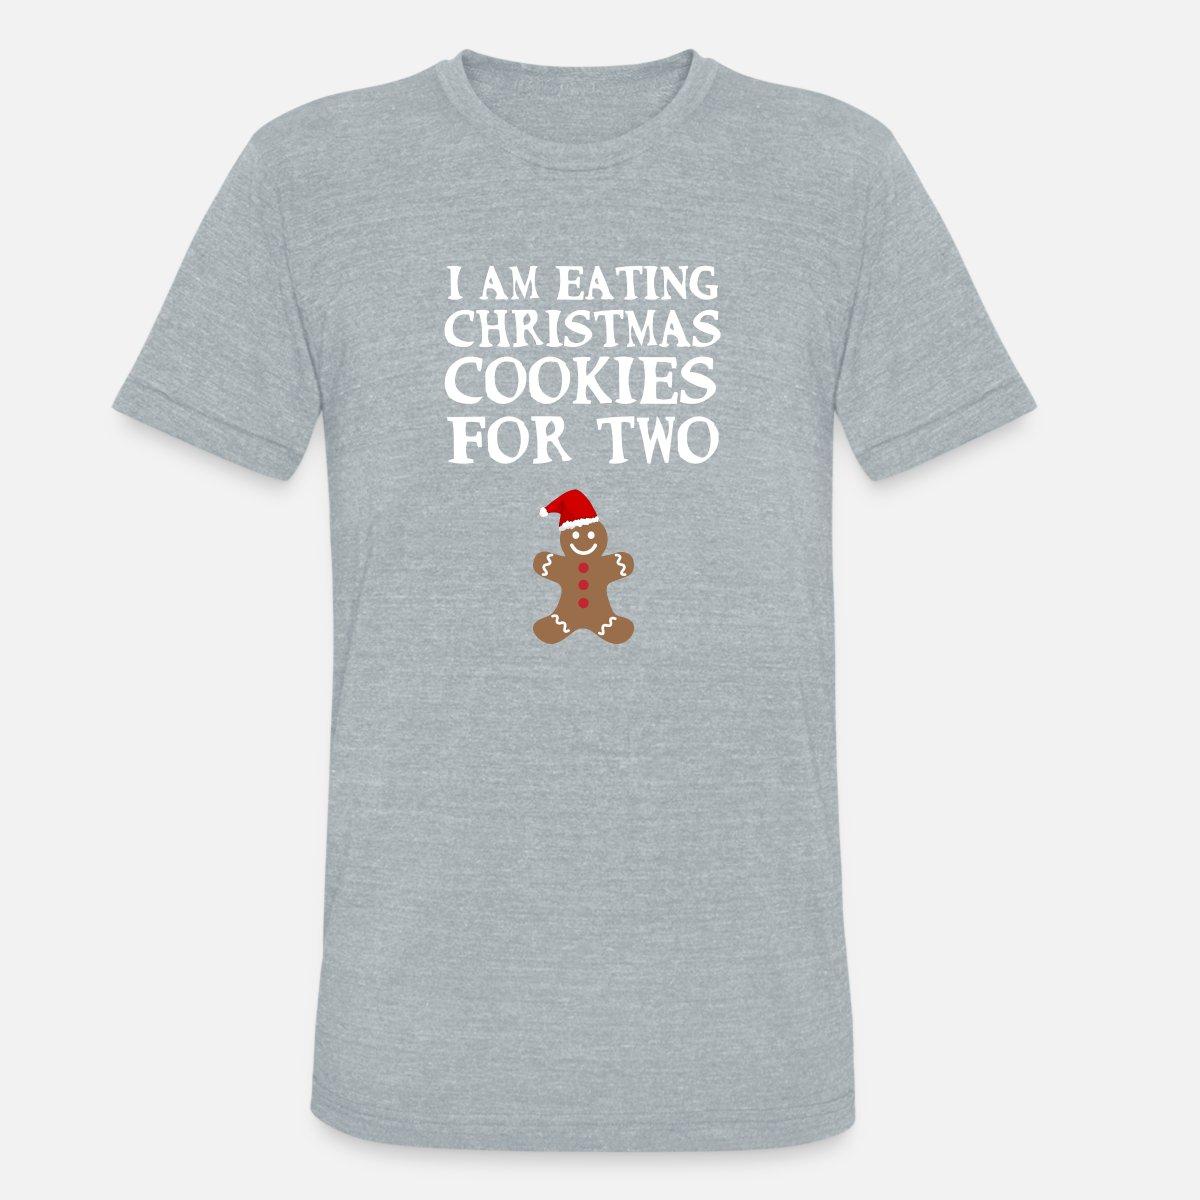 a68403b7690ff Funny Christmas Pregnancy Announcement Gingerbread Unisex Tri-Blend T-Shirt  | Spreadshirt